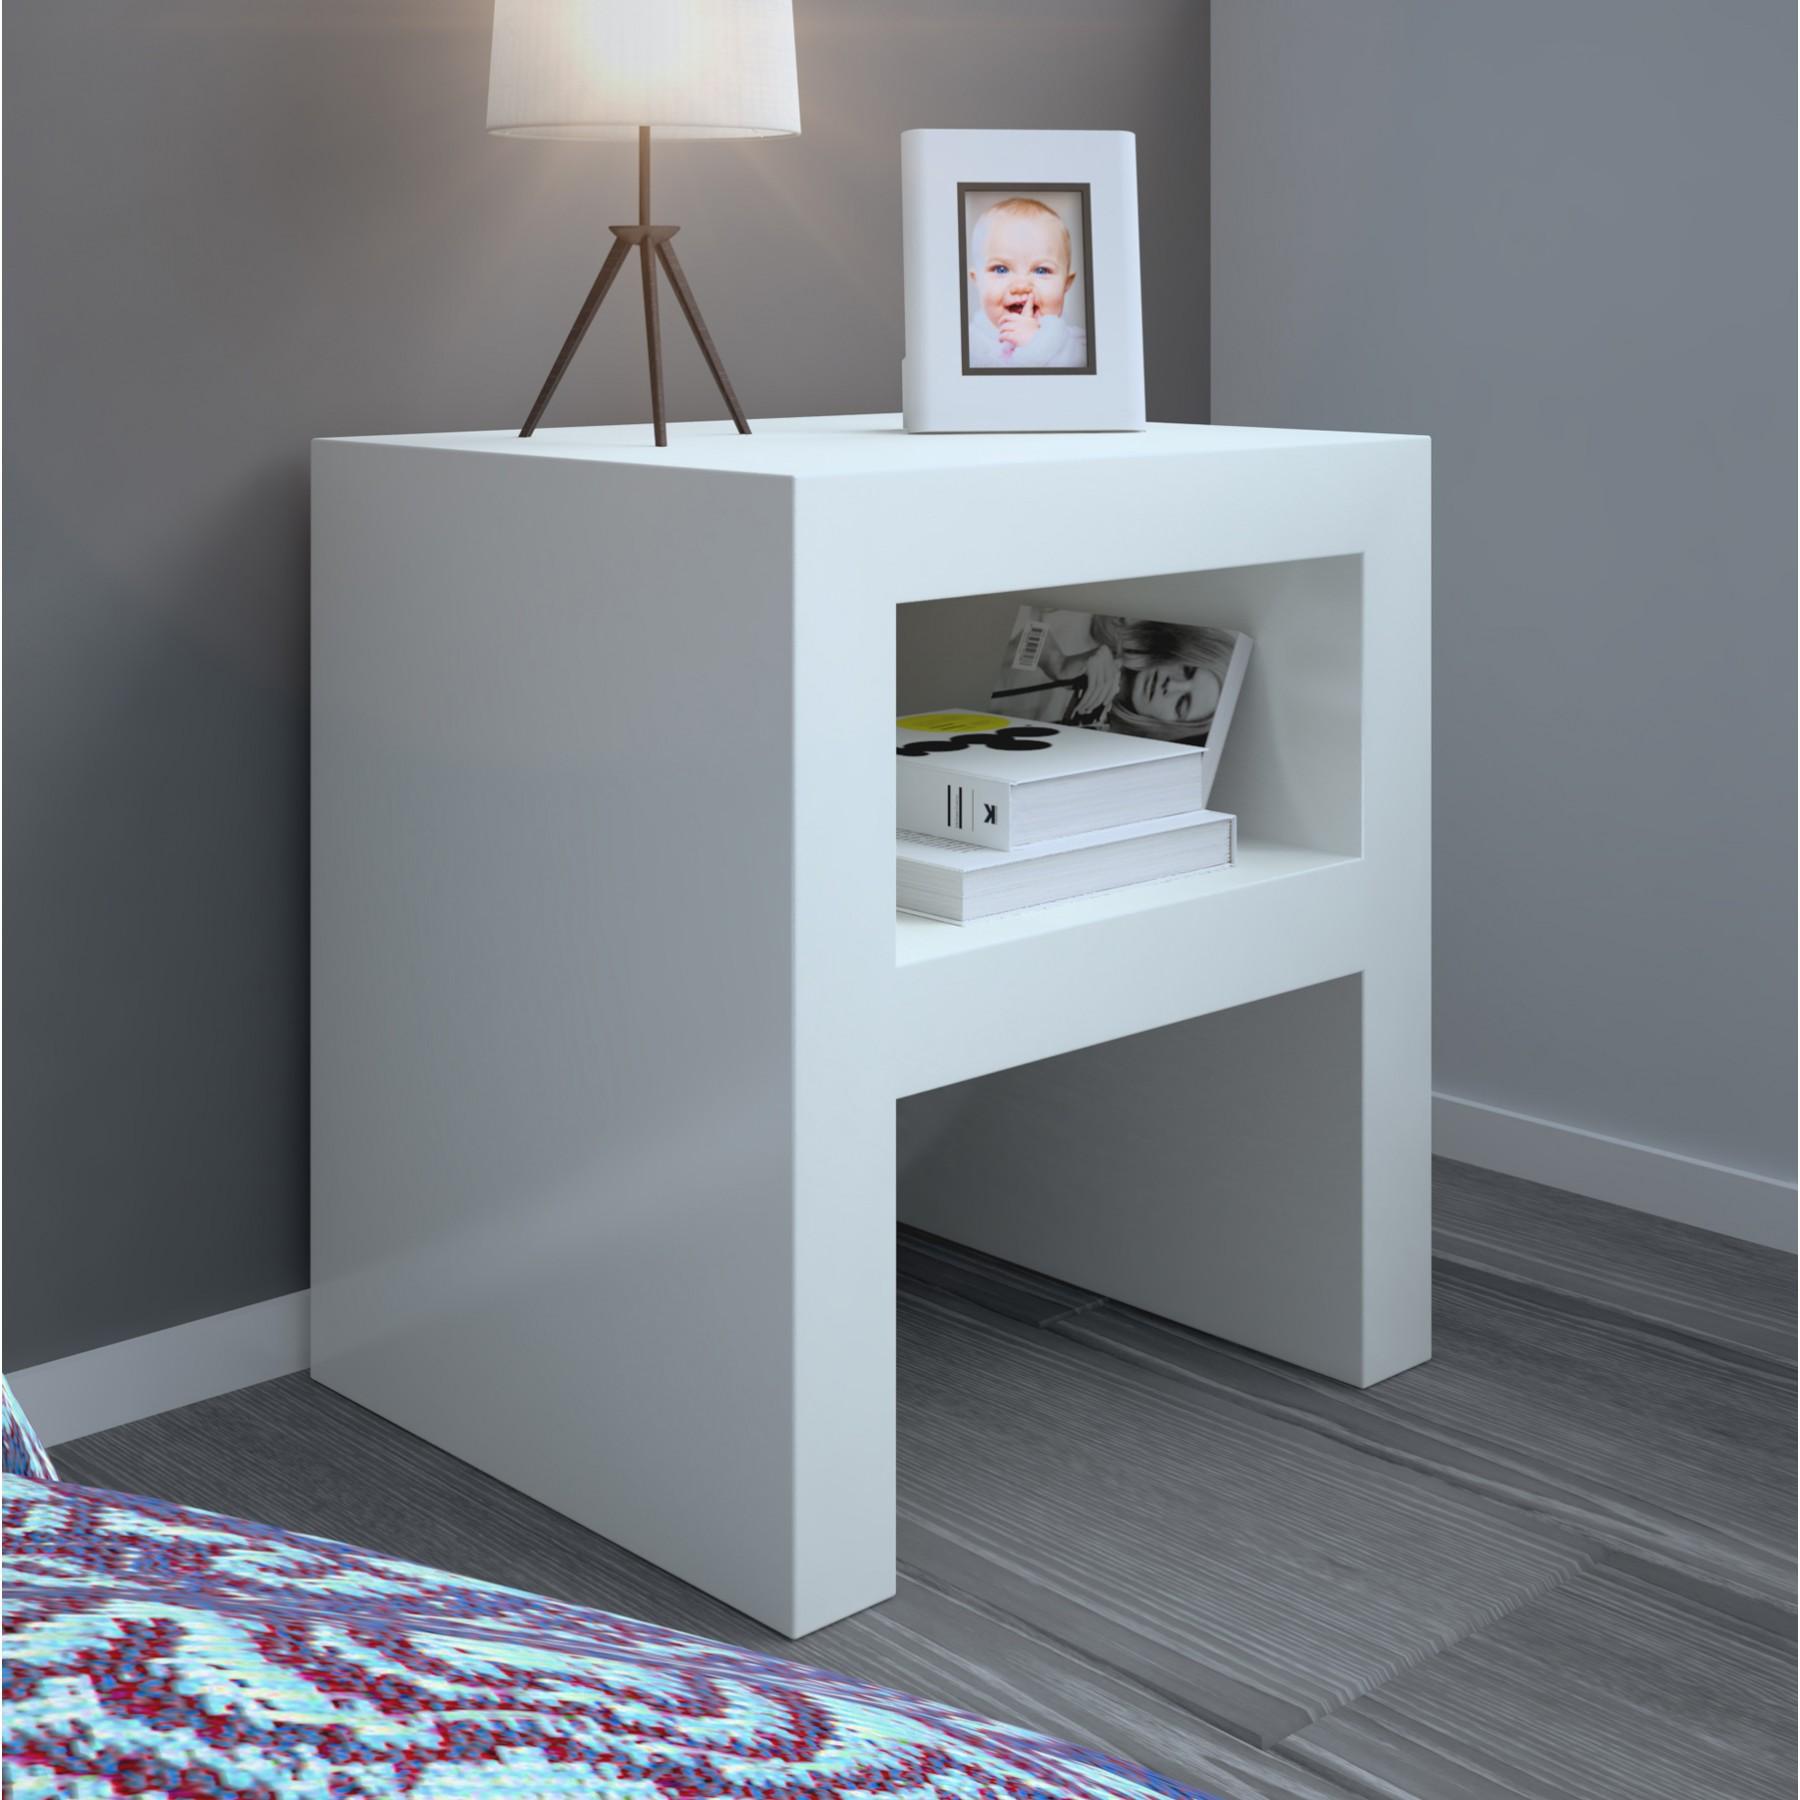 Mesa de noche minimalista moderna lacada blanca de dise o - Mesitas de noche de diseno ...